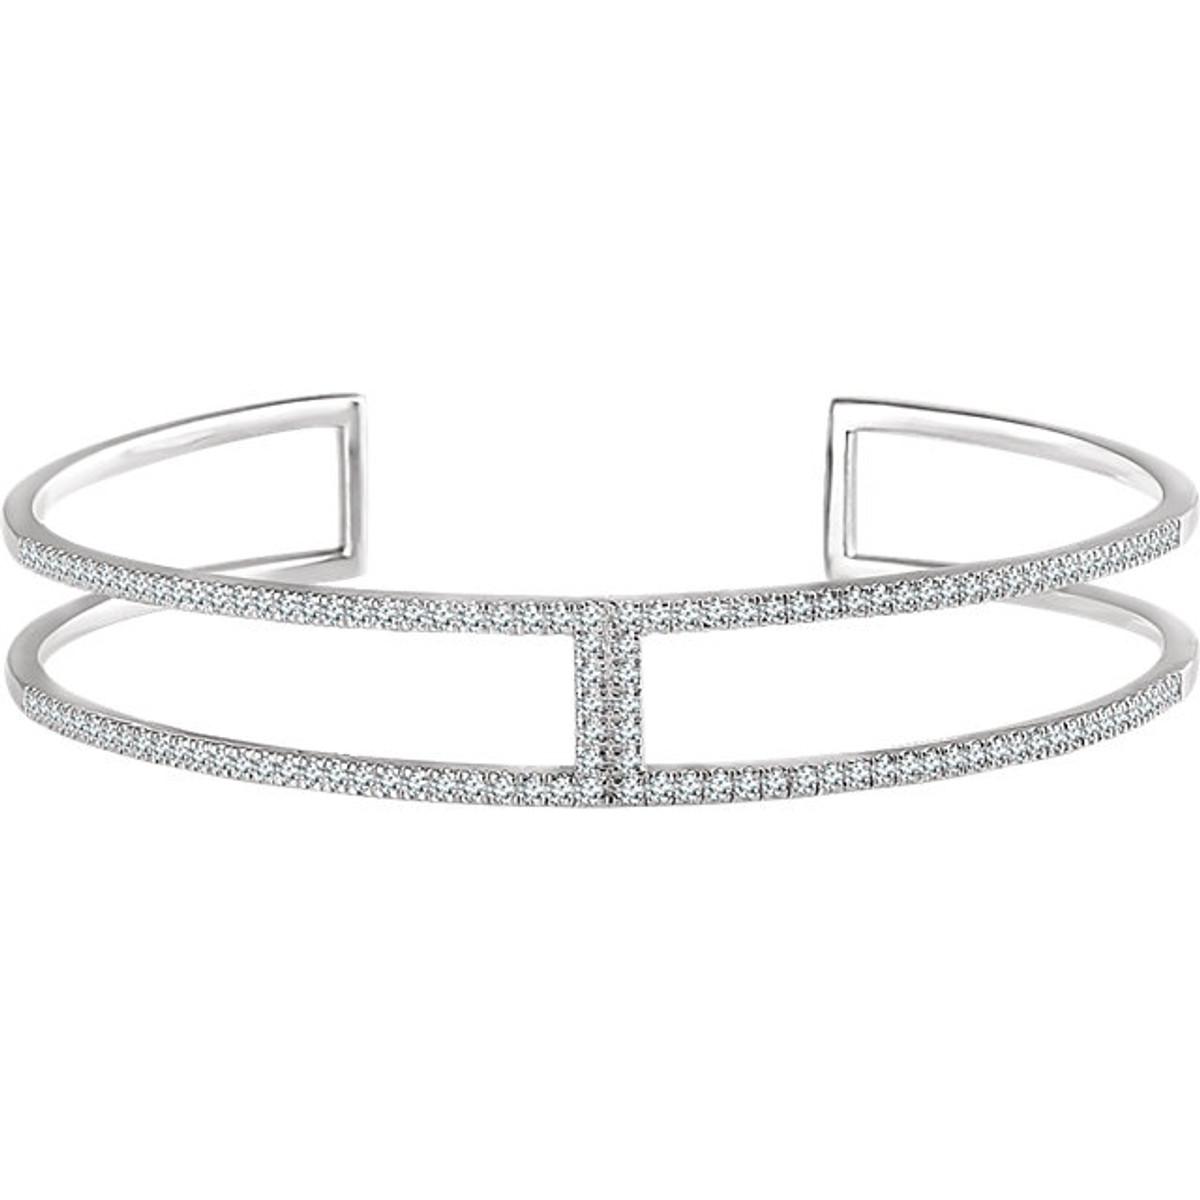 White Gold Diamond Cuff Bracelet